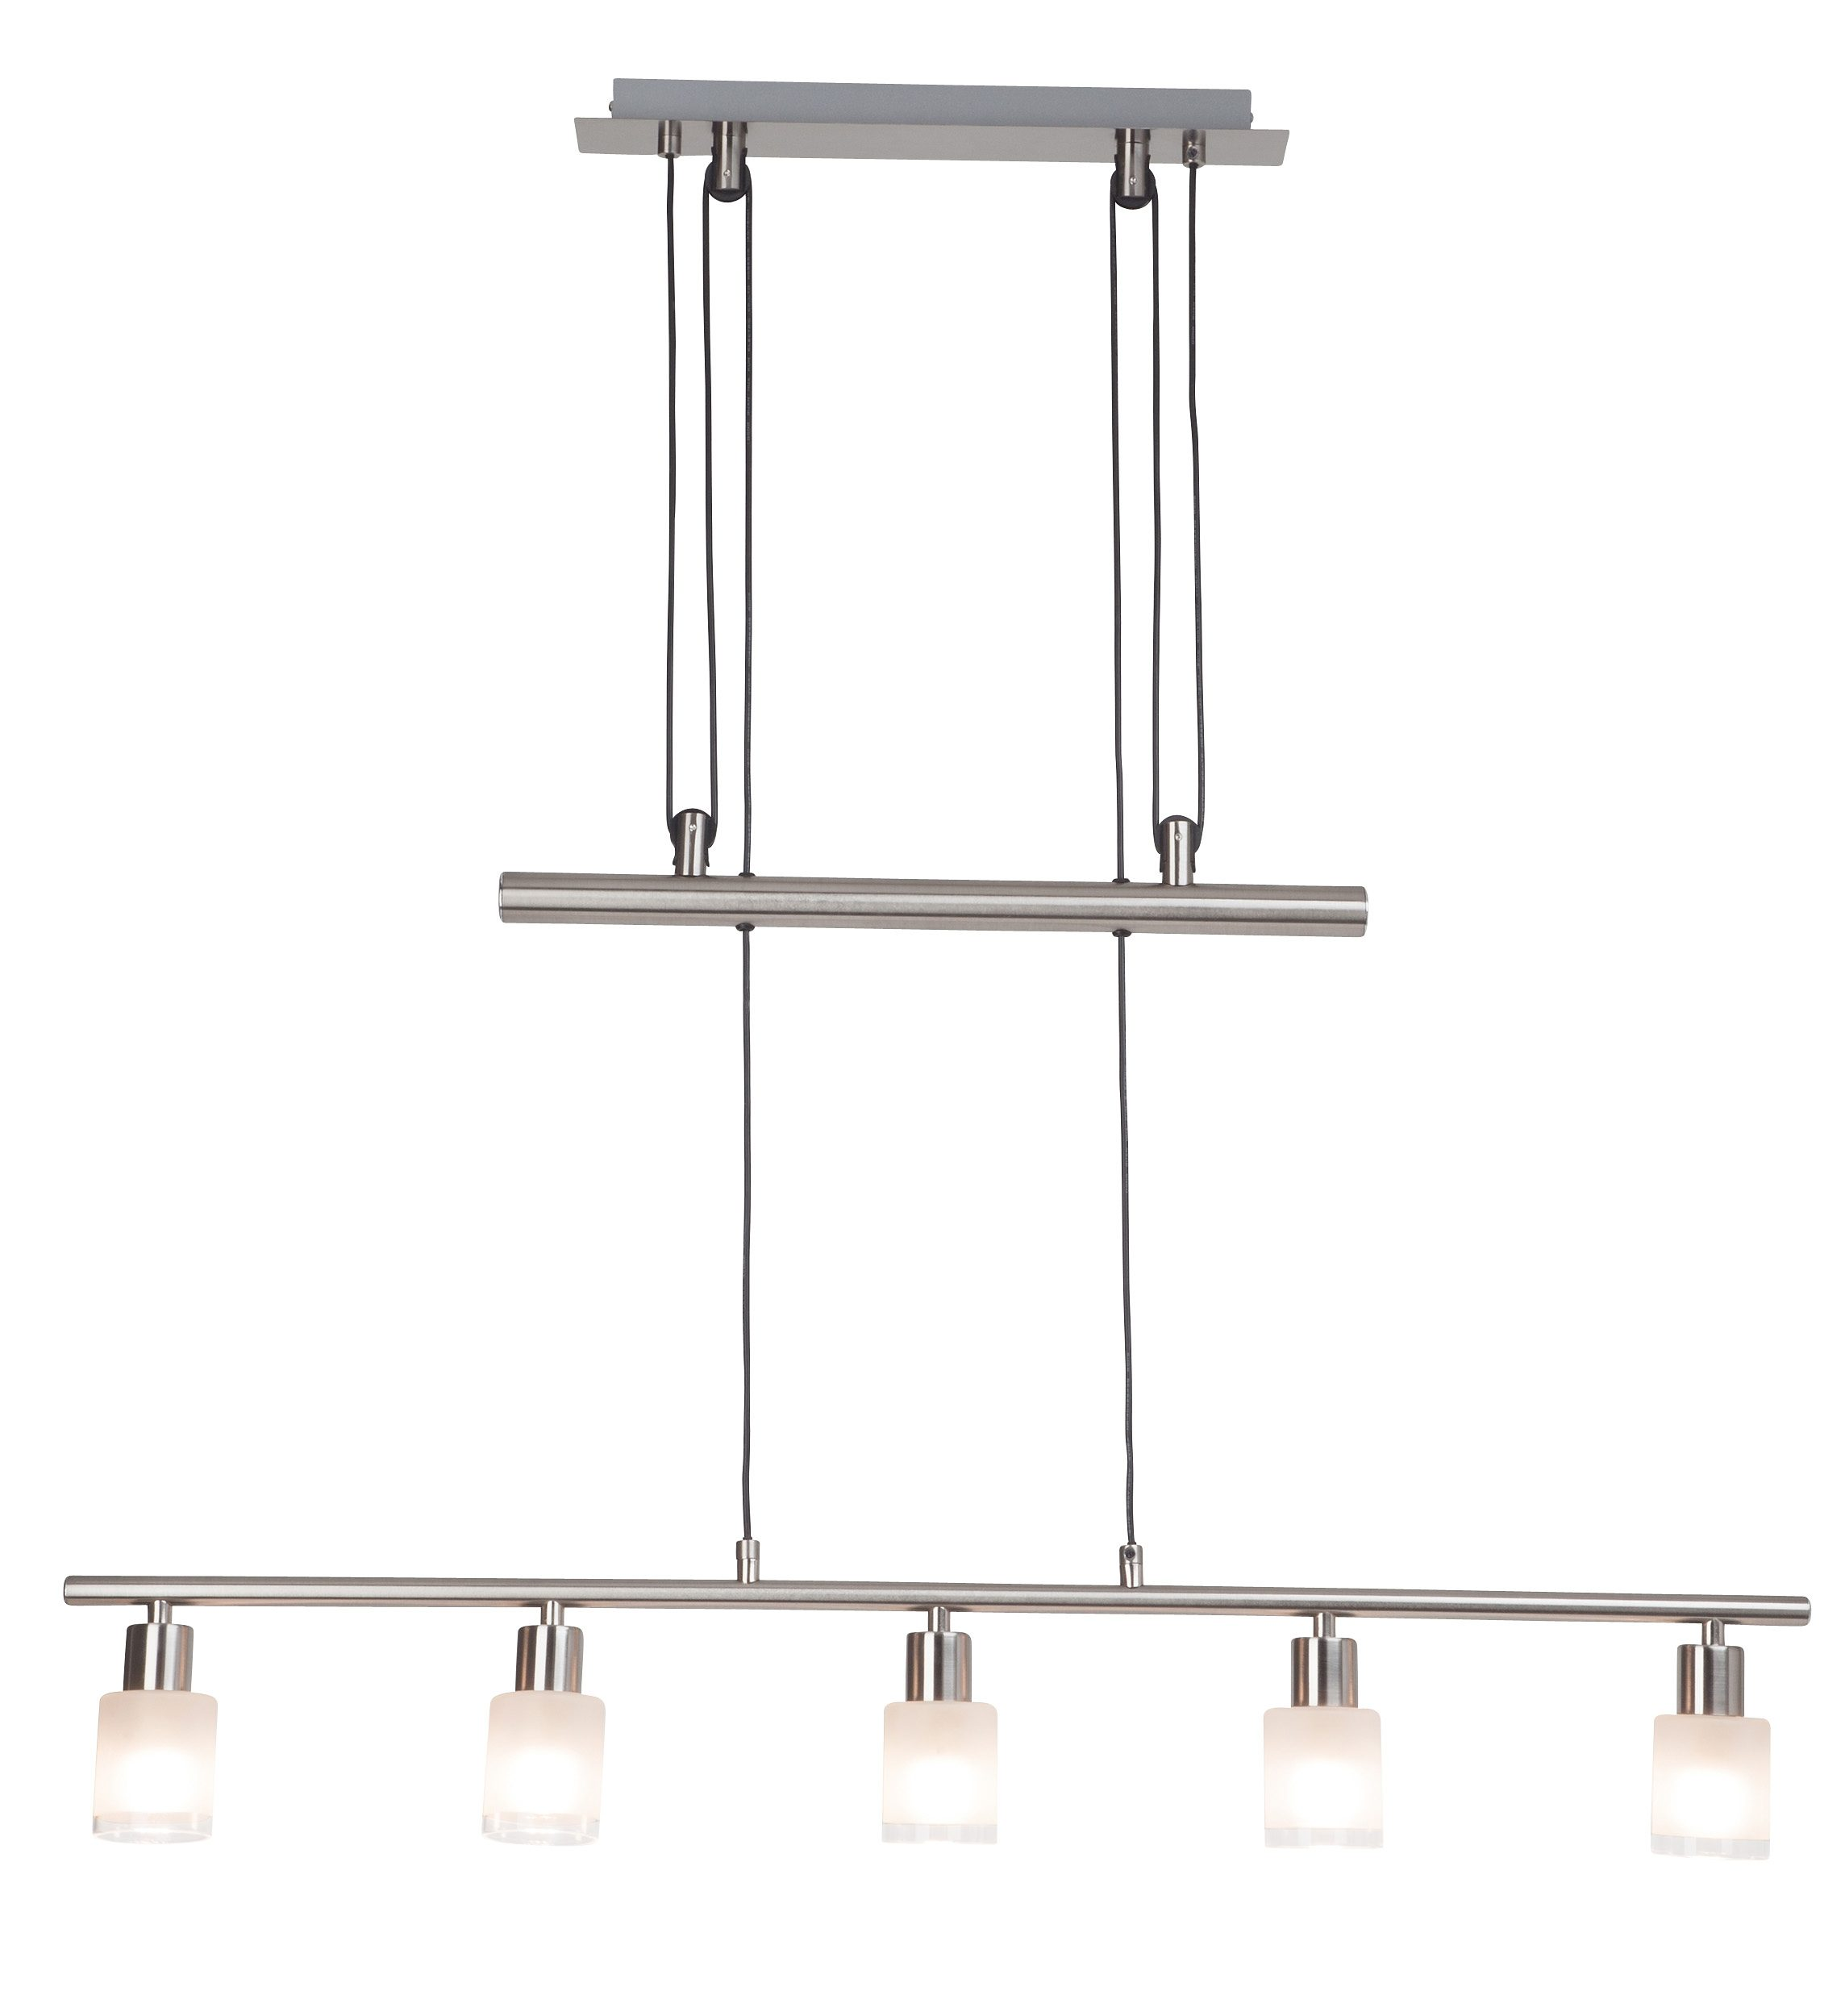 Brilliant Leuchten Pendelleuchte, inkl. LED-Leuchtmittel, 5 flammig